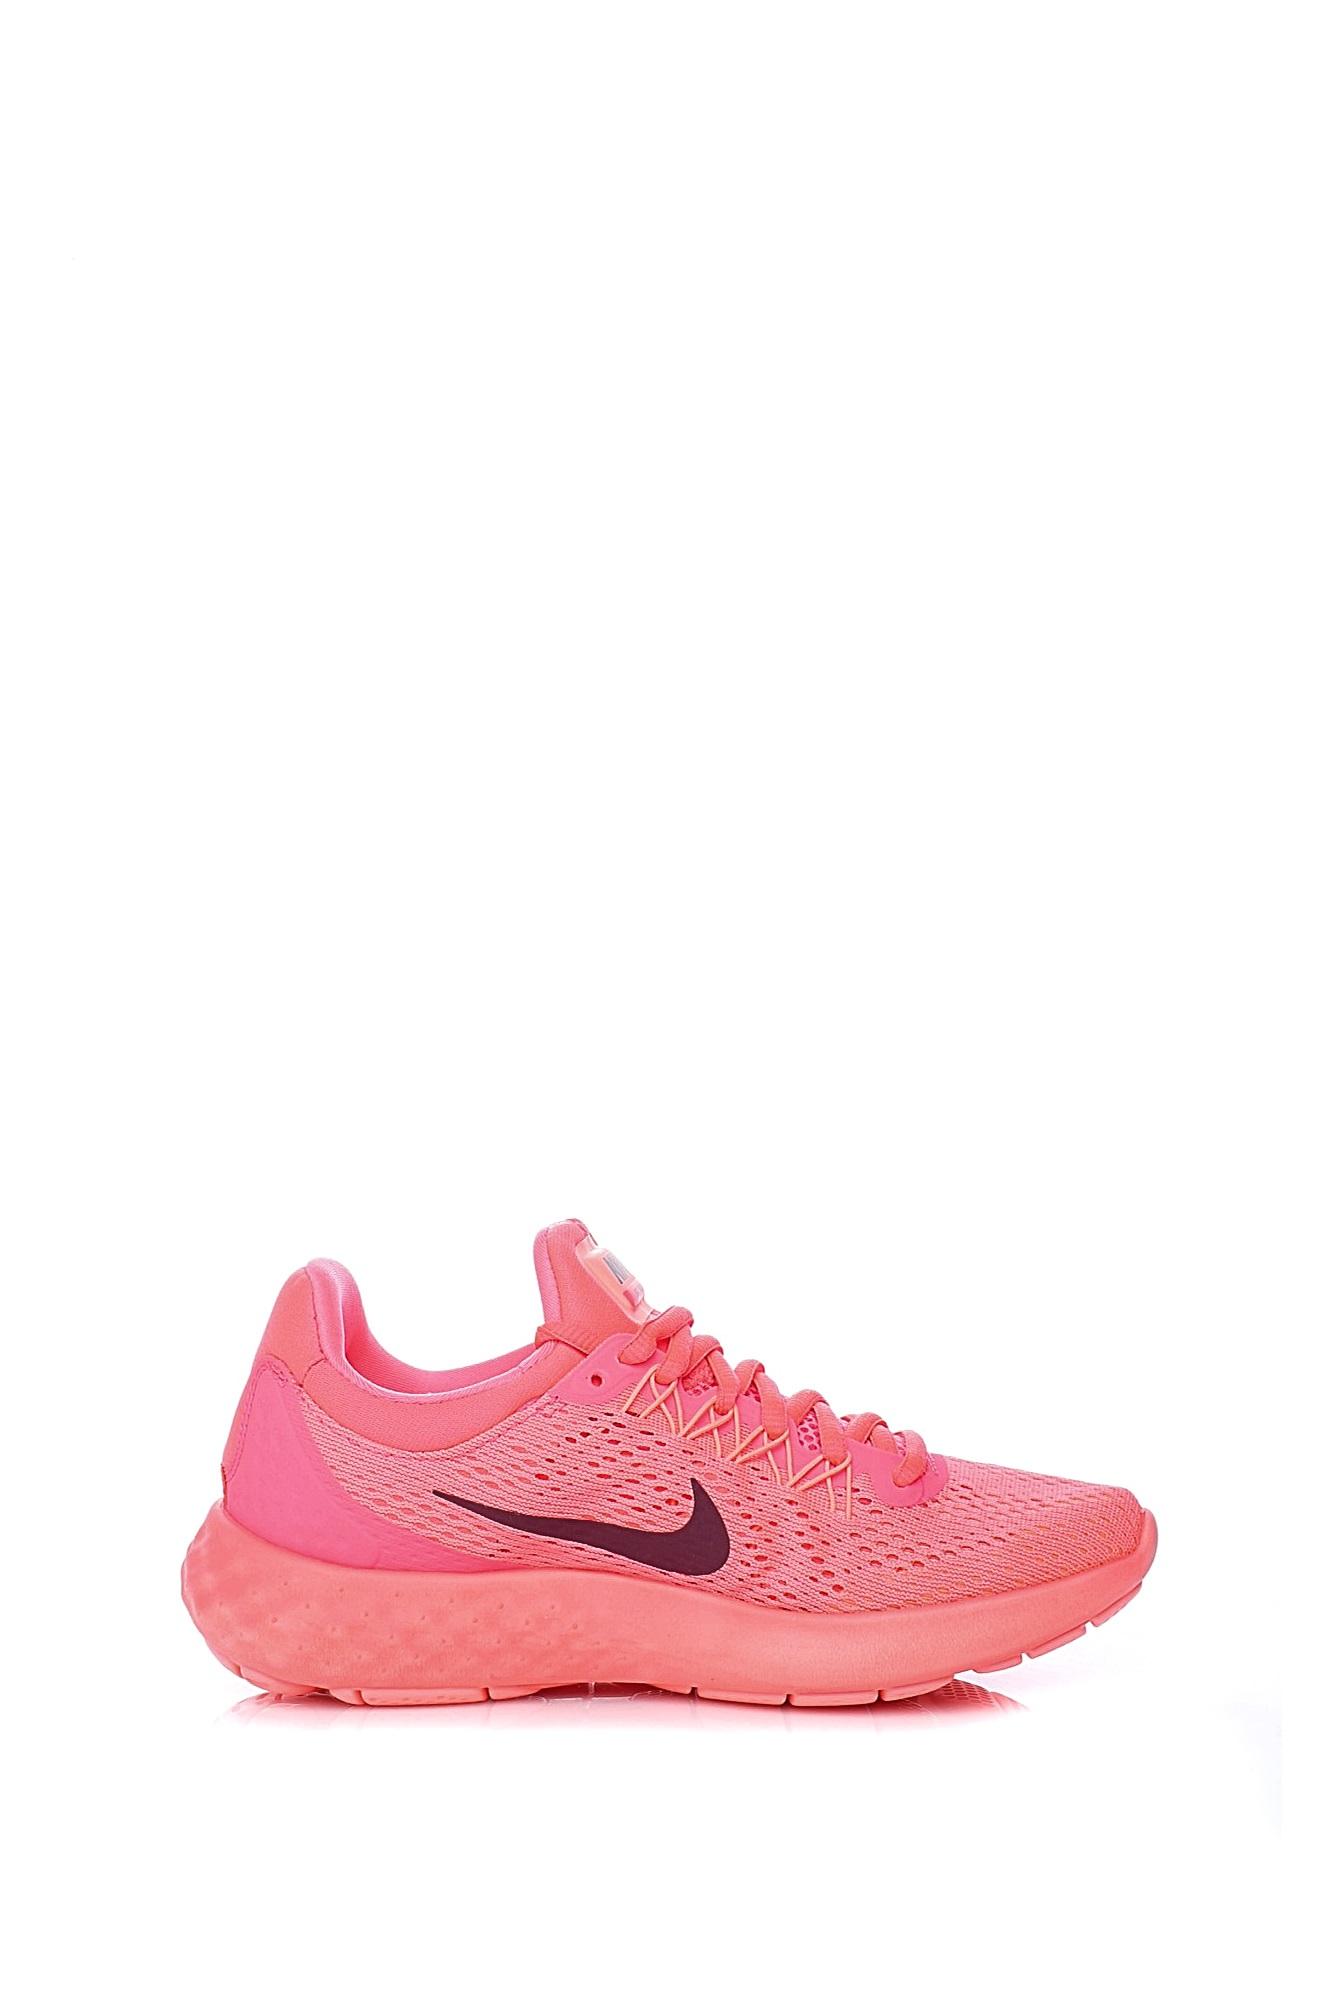 NIKE – Γυναικεία αθλητικά παπούτσια Nike LUNAR SKYELUX φούξια